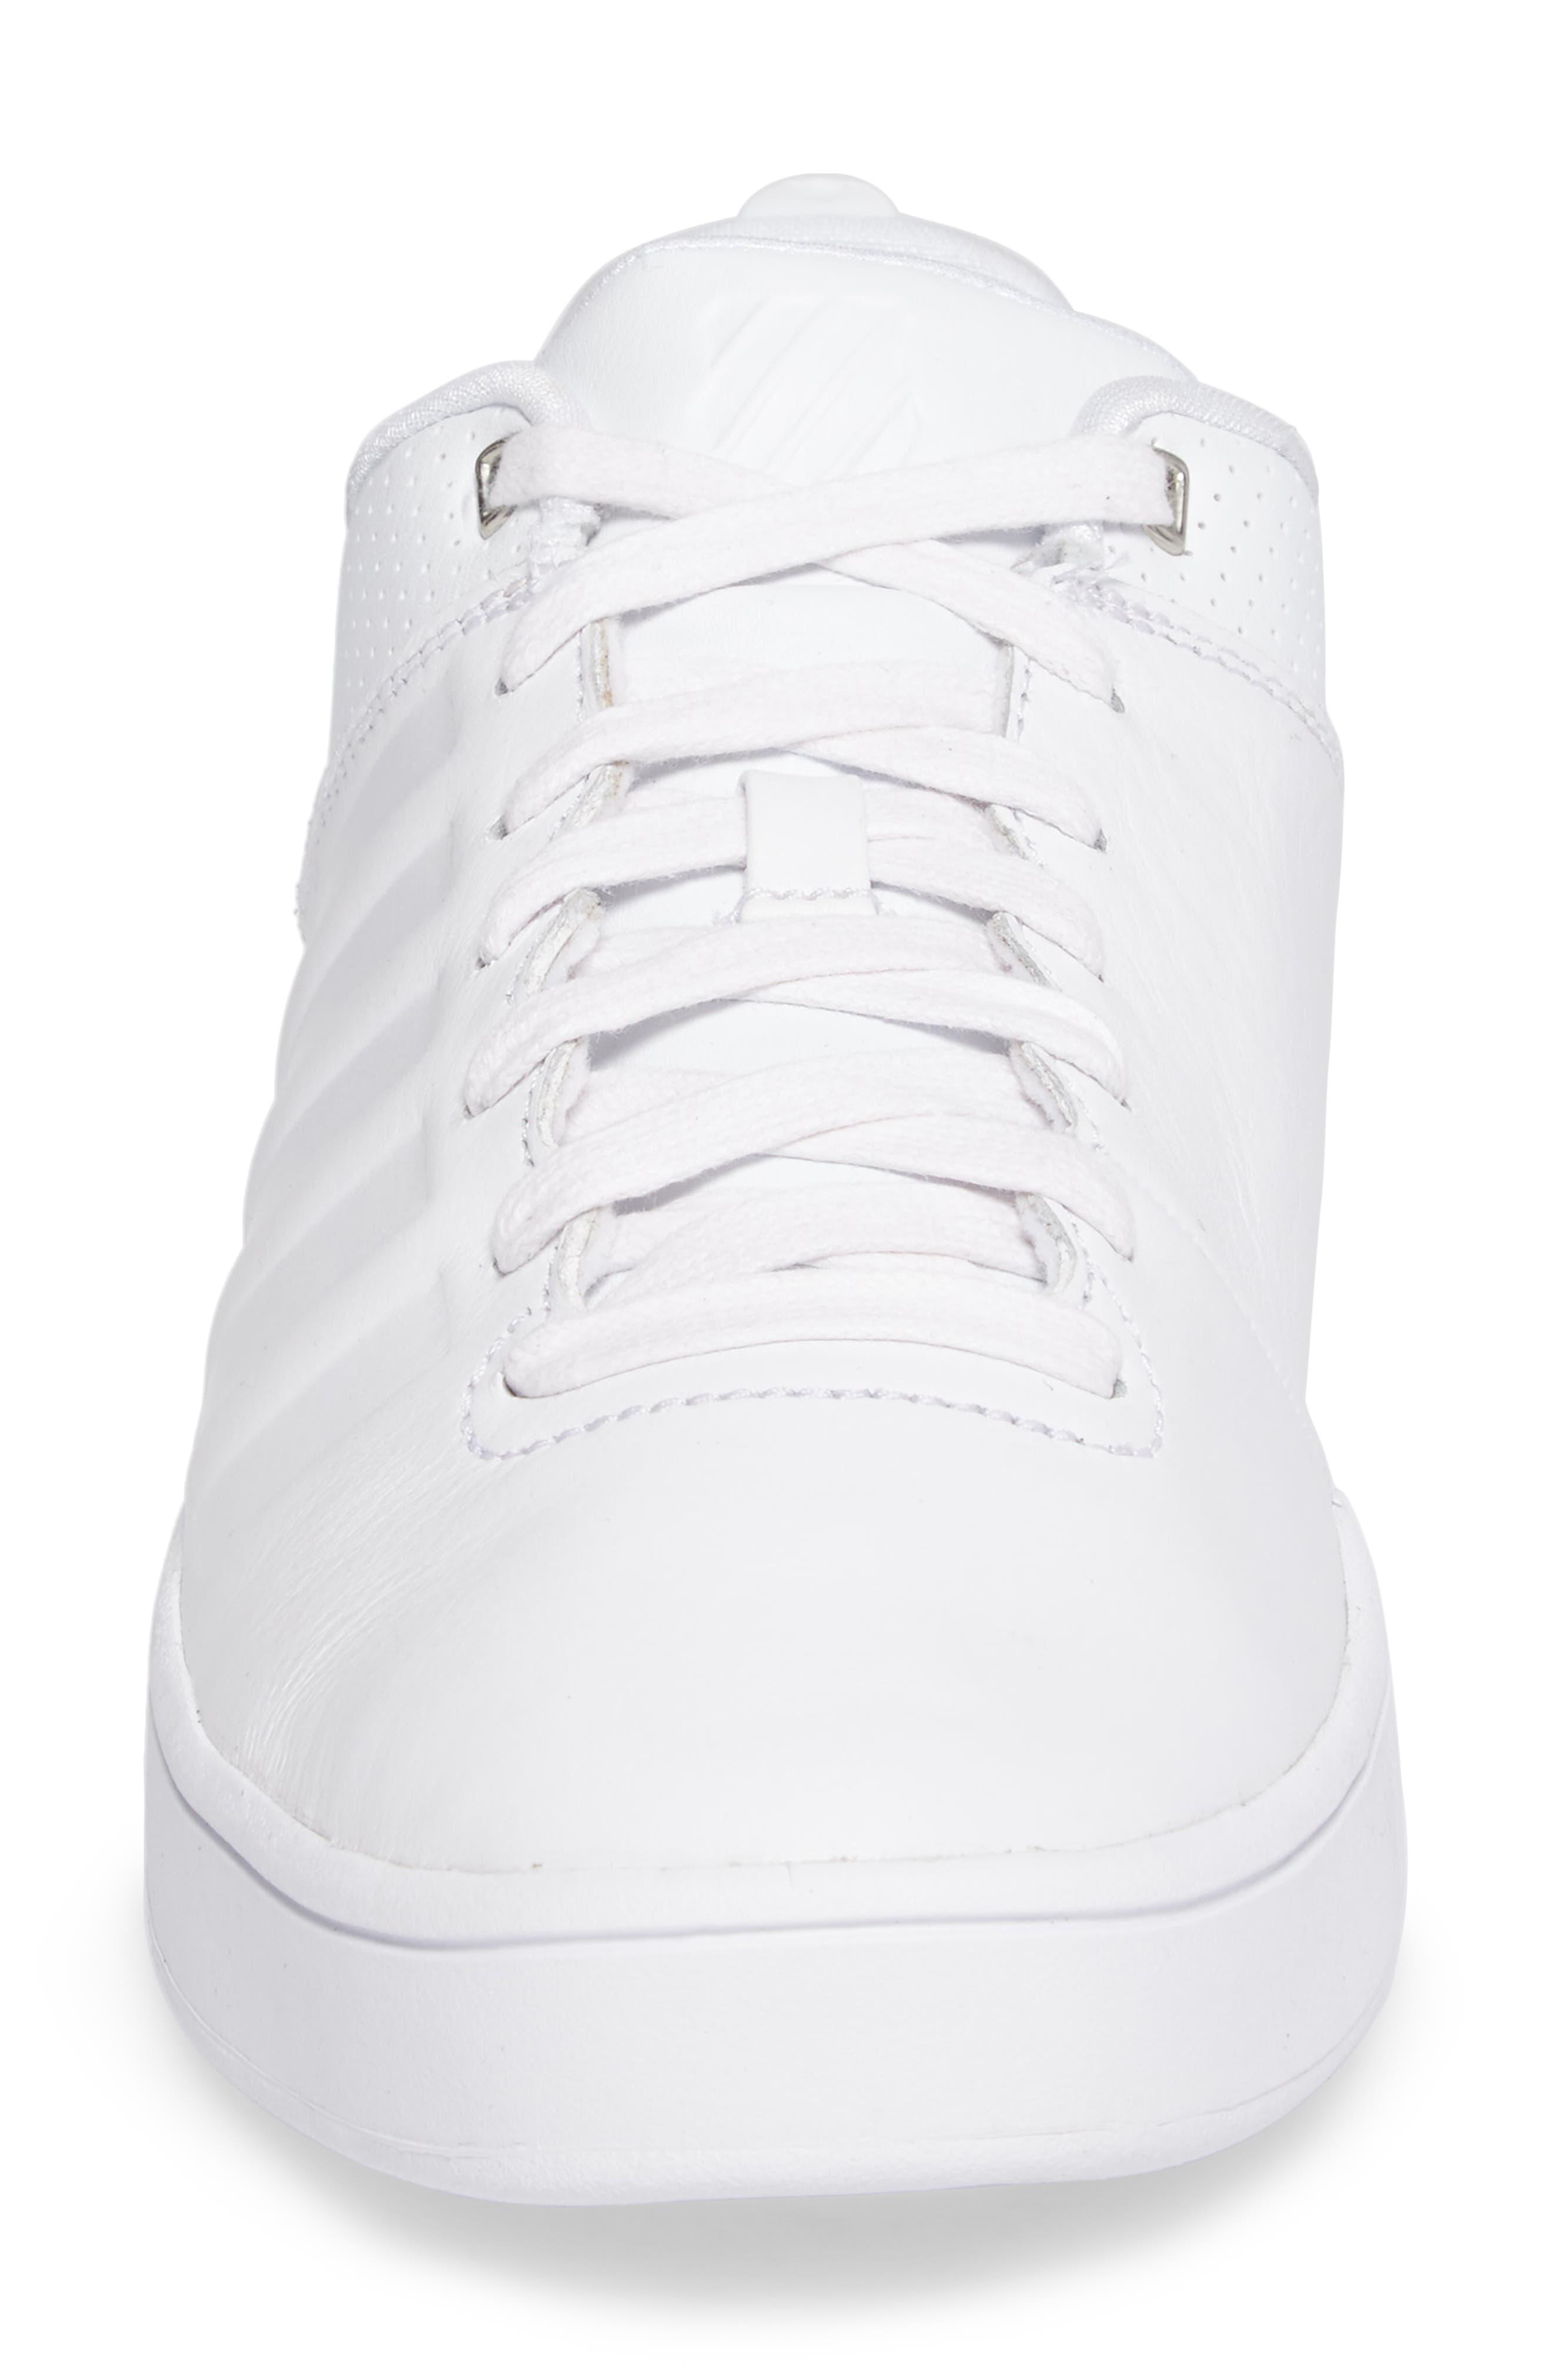 Court Westan Sneaker,                             Alternate thumbnail 8, color,